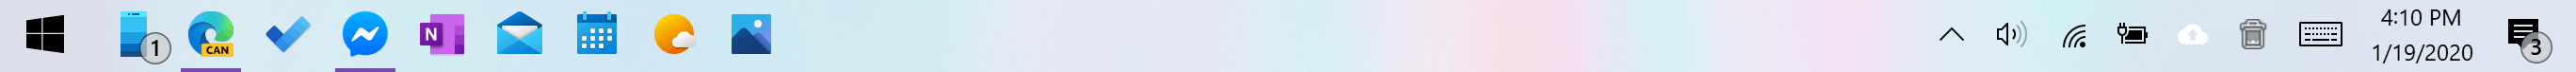 Windows 10 New Colorful Icons Taskbar